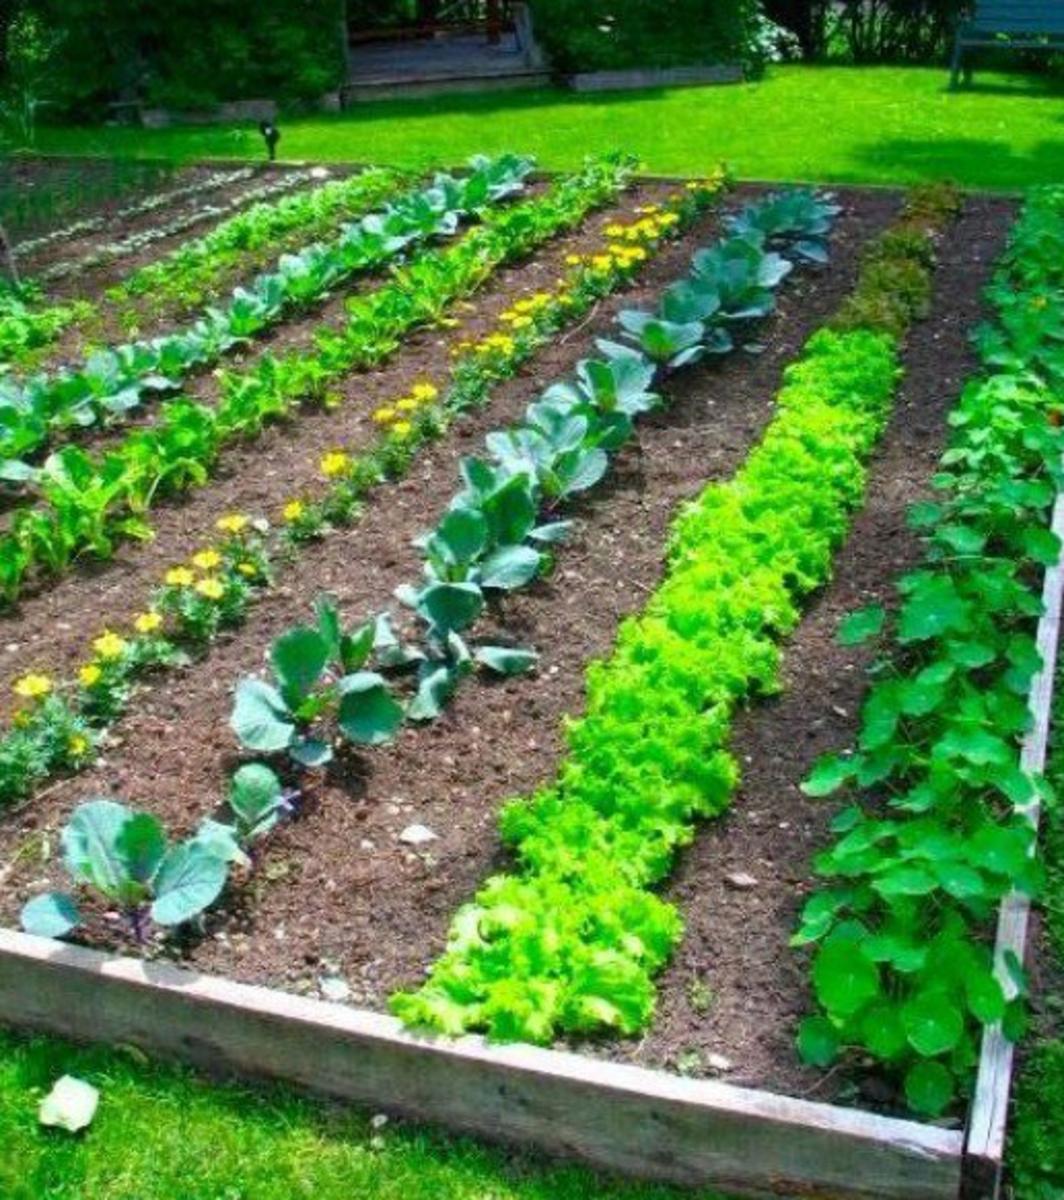 101 Gardening Secrets the Experts Never Tell You Dengarden